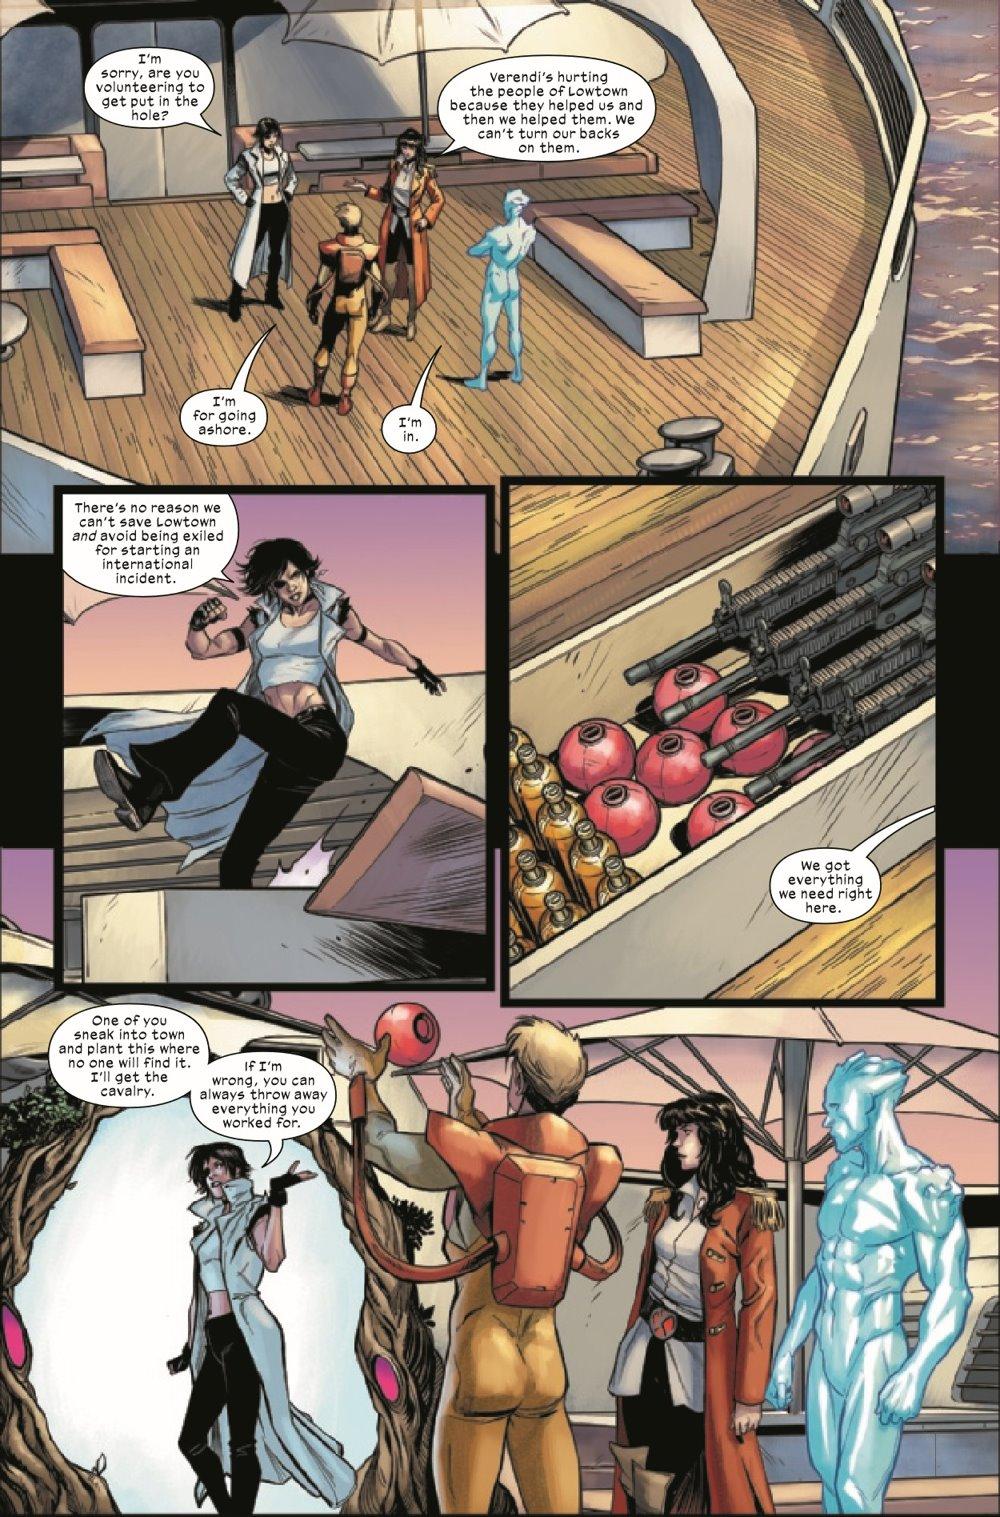 MARAUDERS2019019_Preview-2 ComicList Previews: MARAUDERS #19